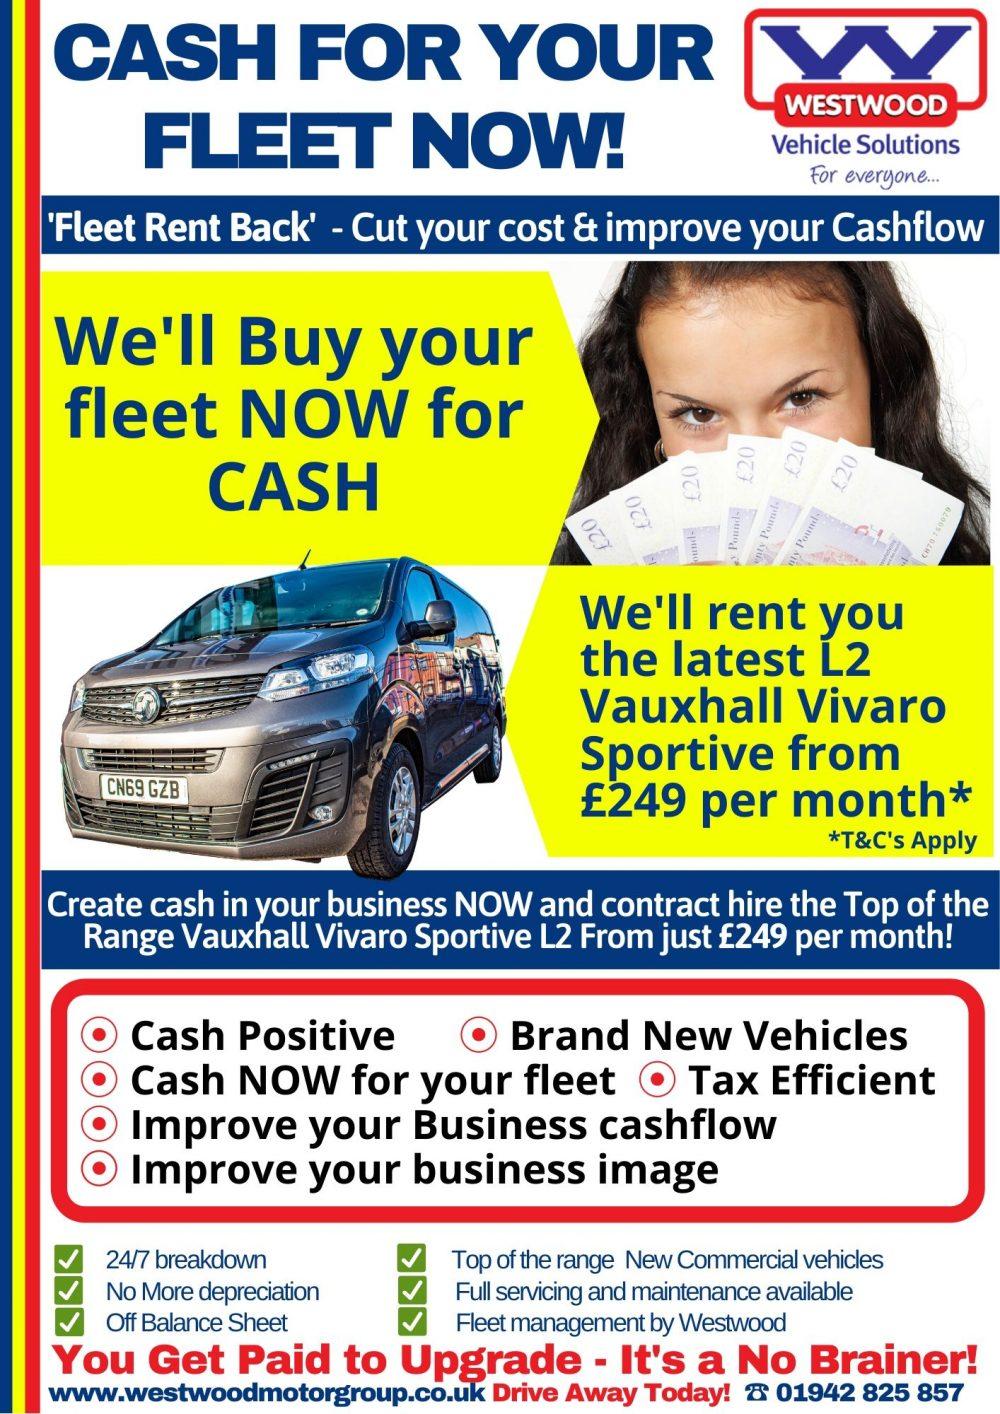 Fleet Swap Vauxhall Vivaro L2 Sportive